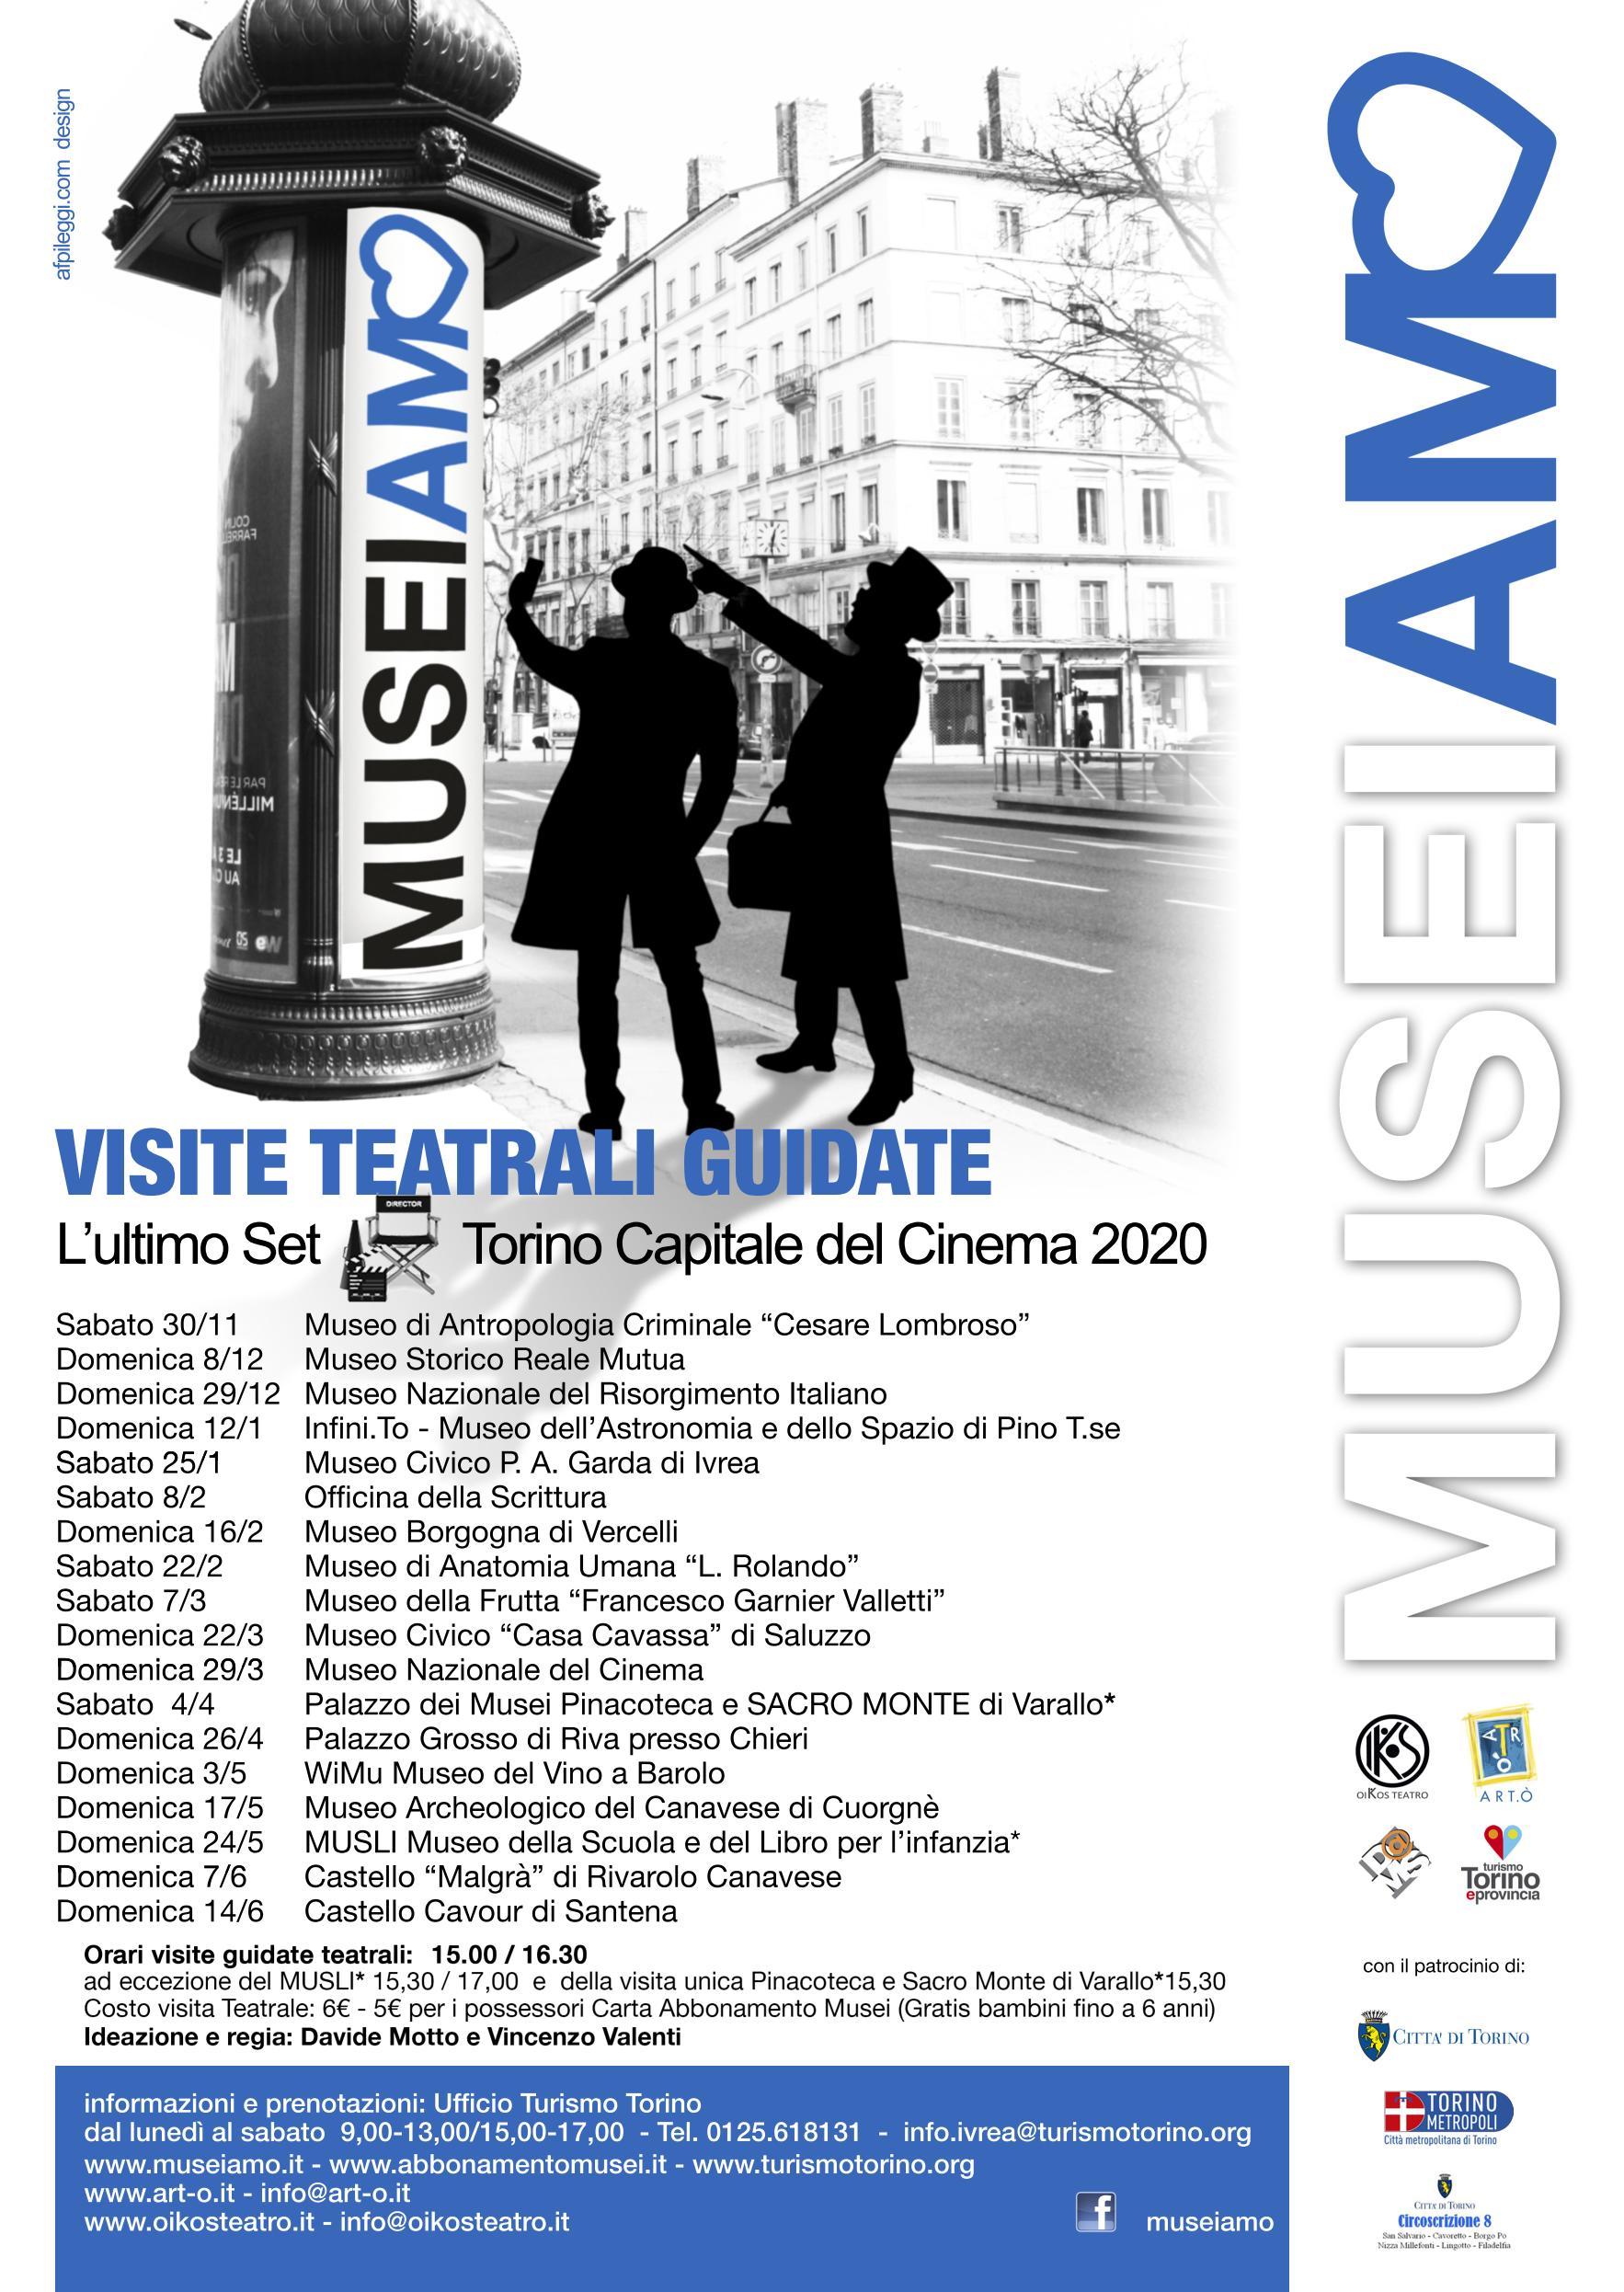 Museiamo_locandina2019stampa